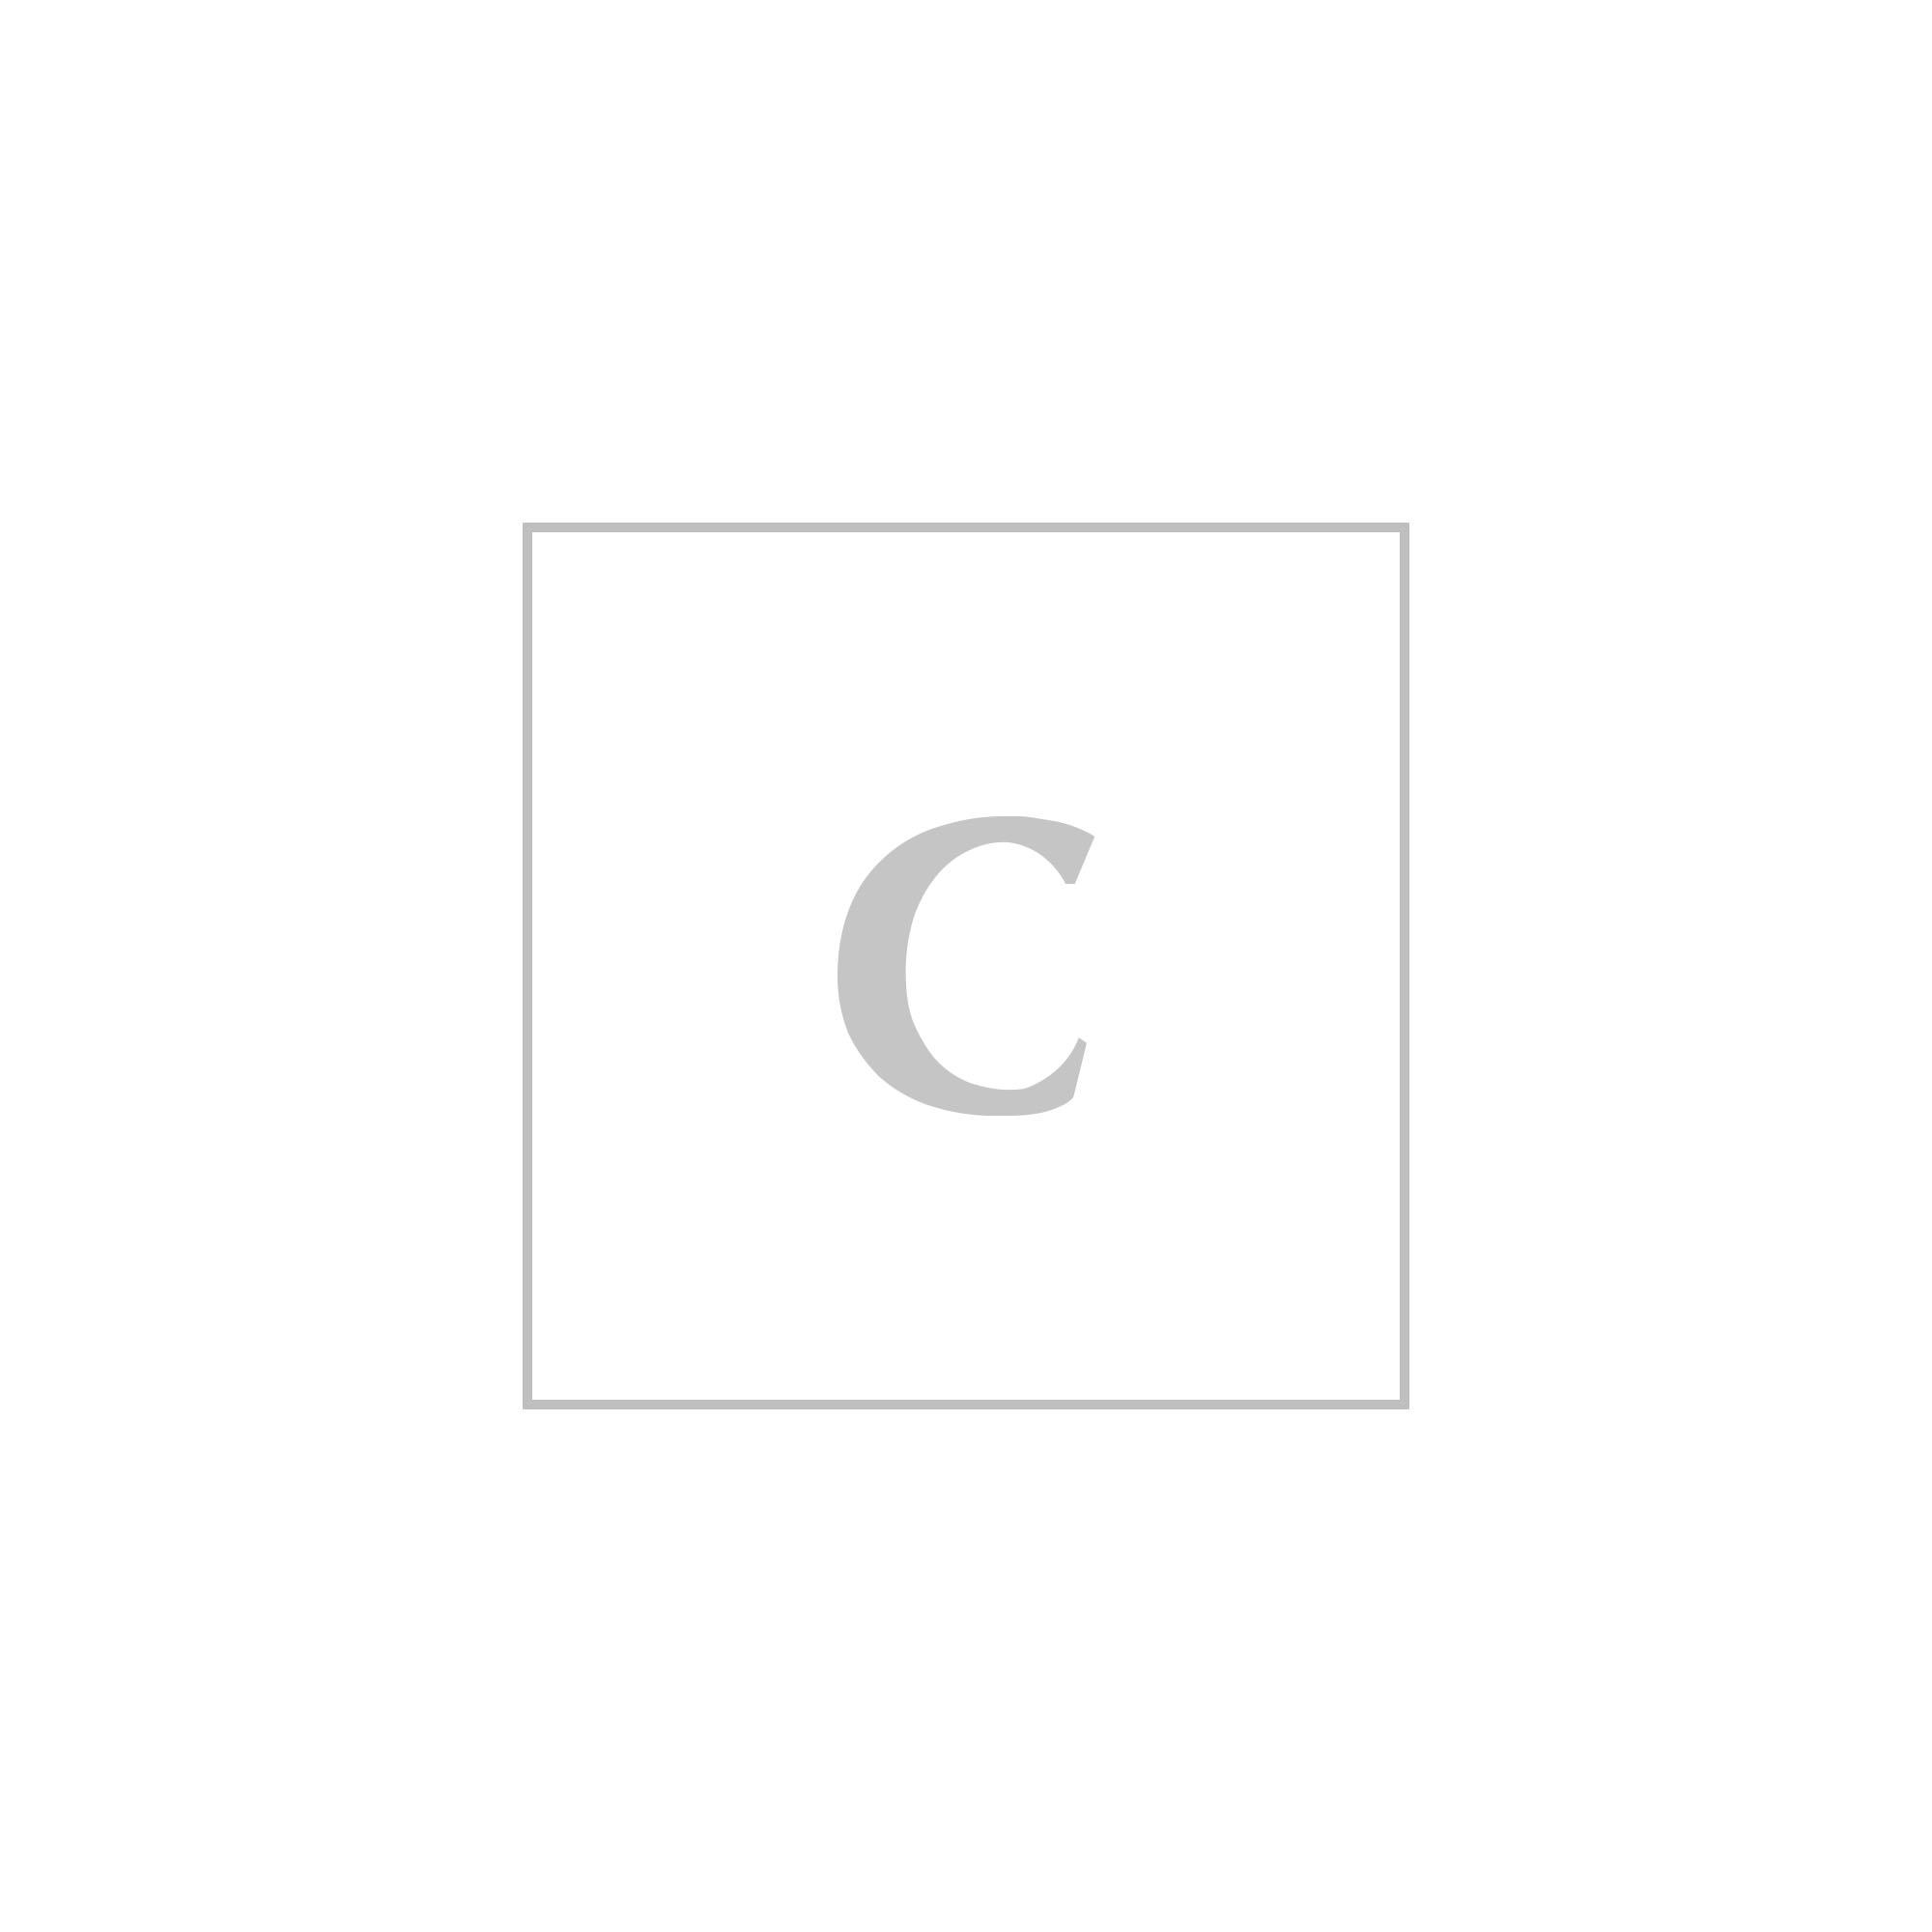 Christian Dior cardholder